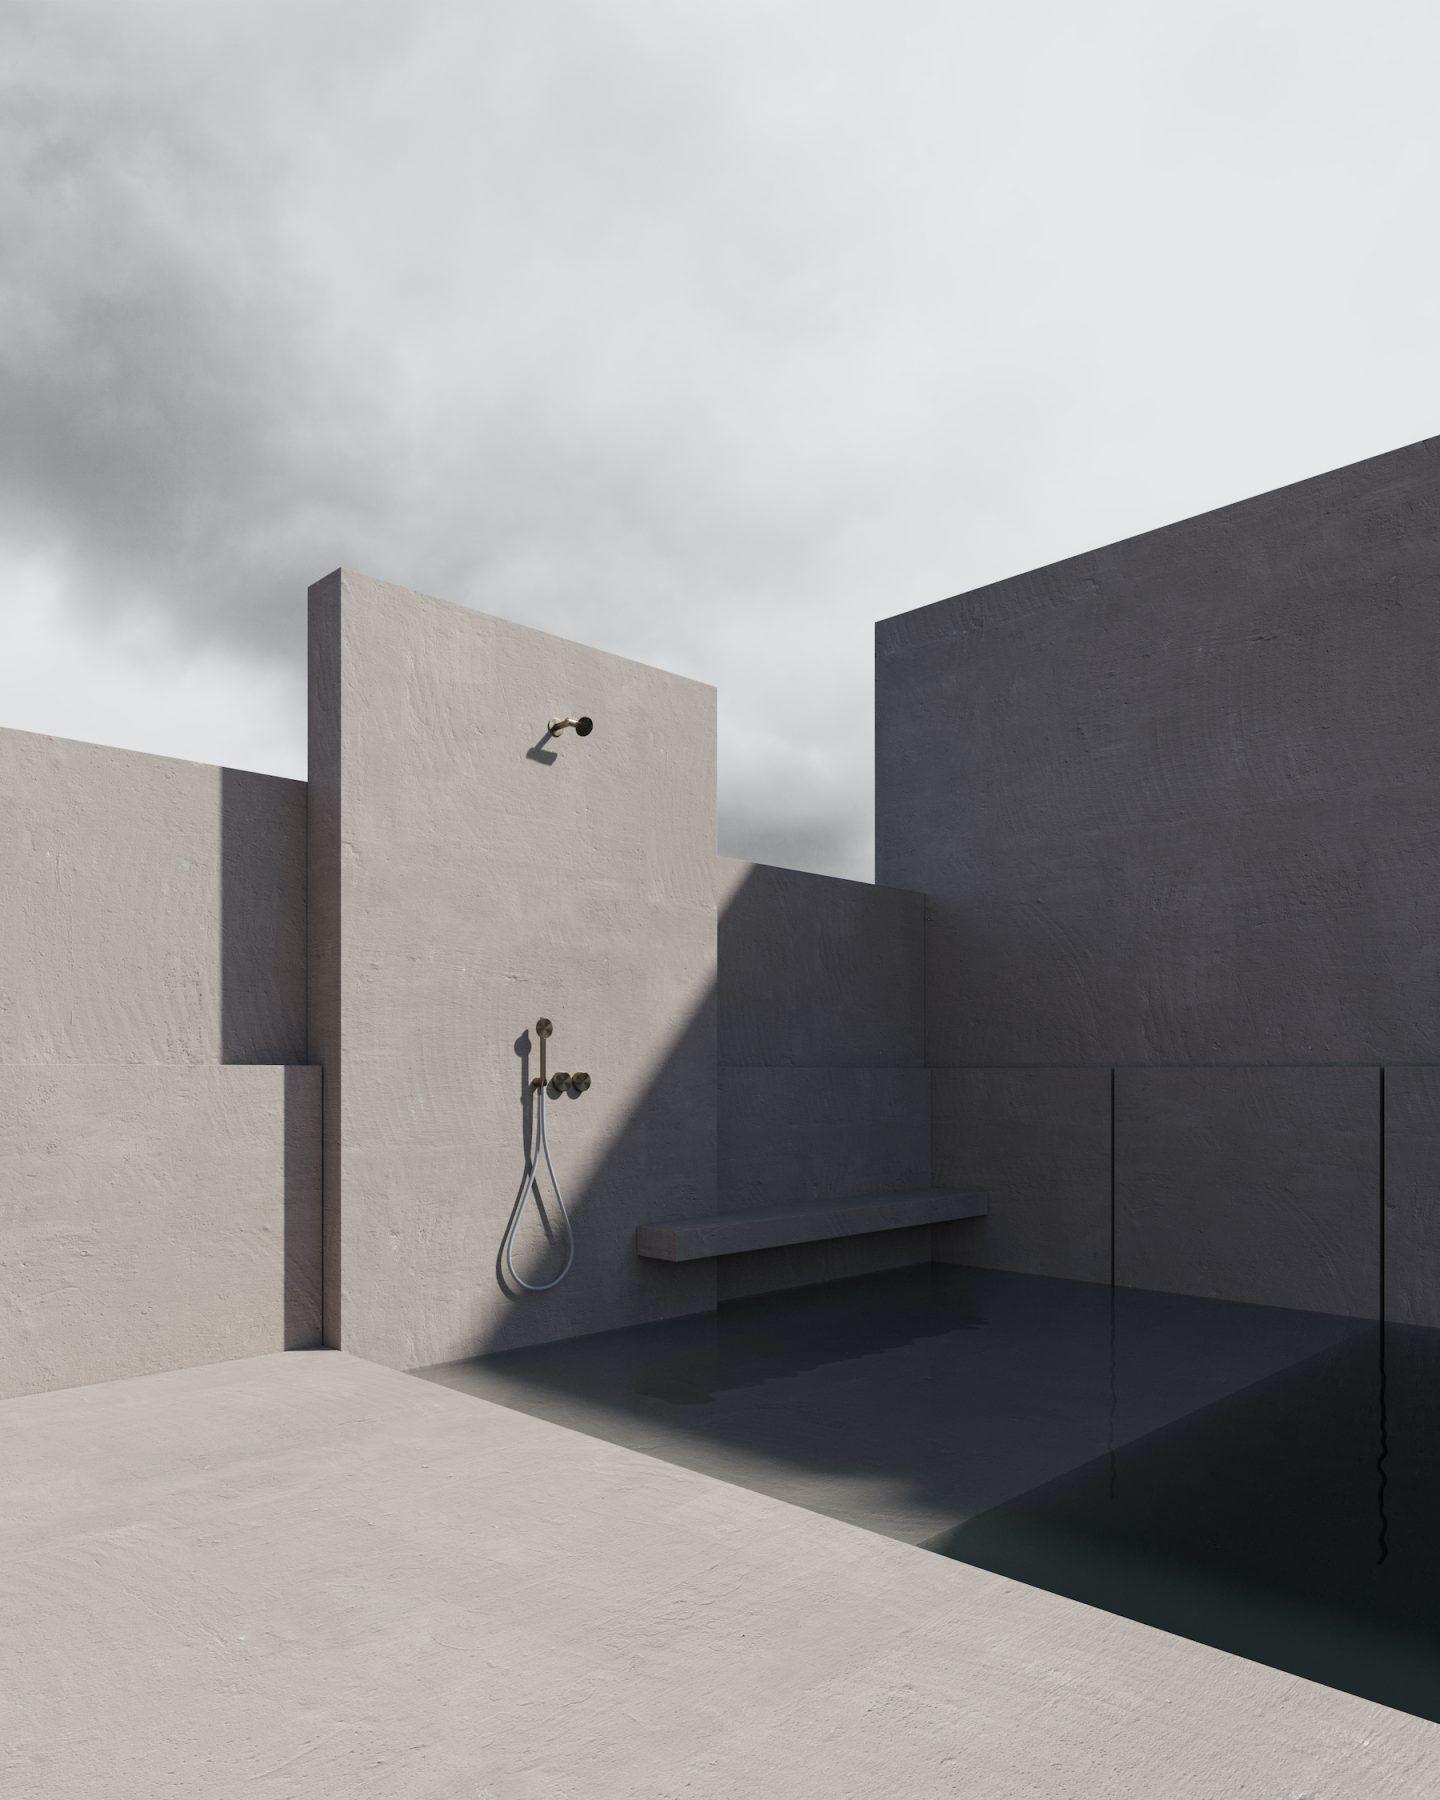 IGNANT-Design-Kanstantsin-Remez-II-Introvert-Residence-04